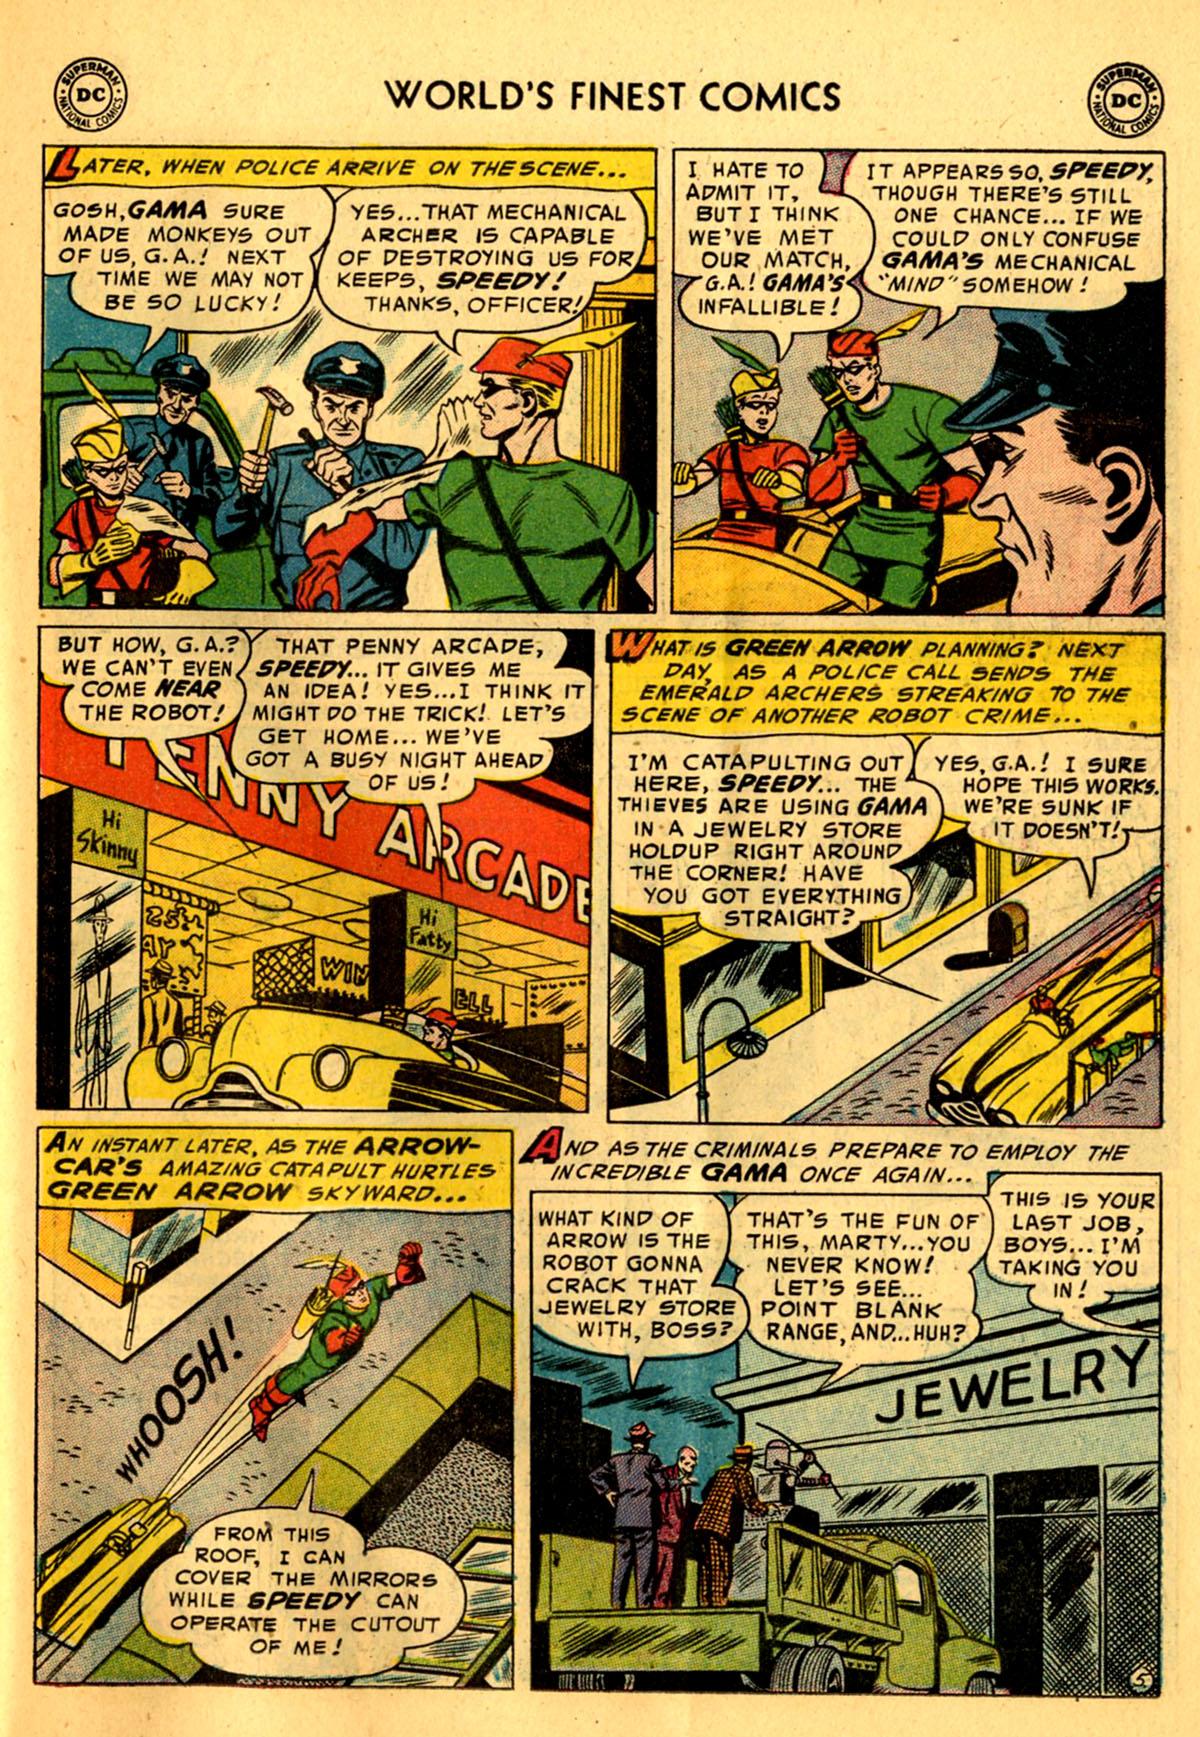 Read online World's Finest Comics comic -  Issue #76 - 23